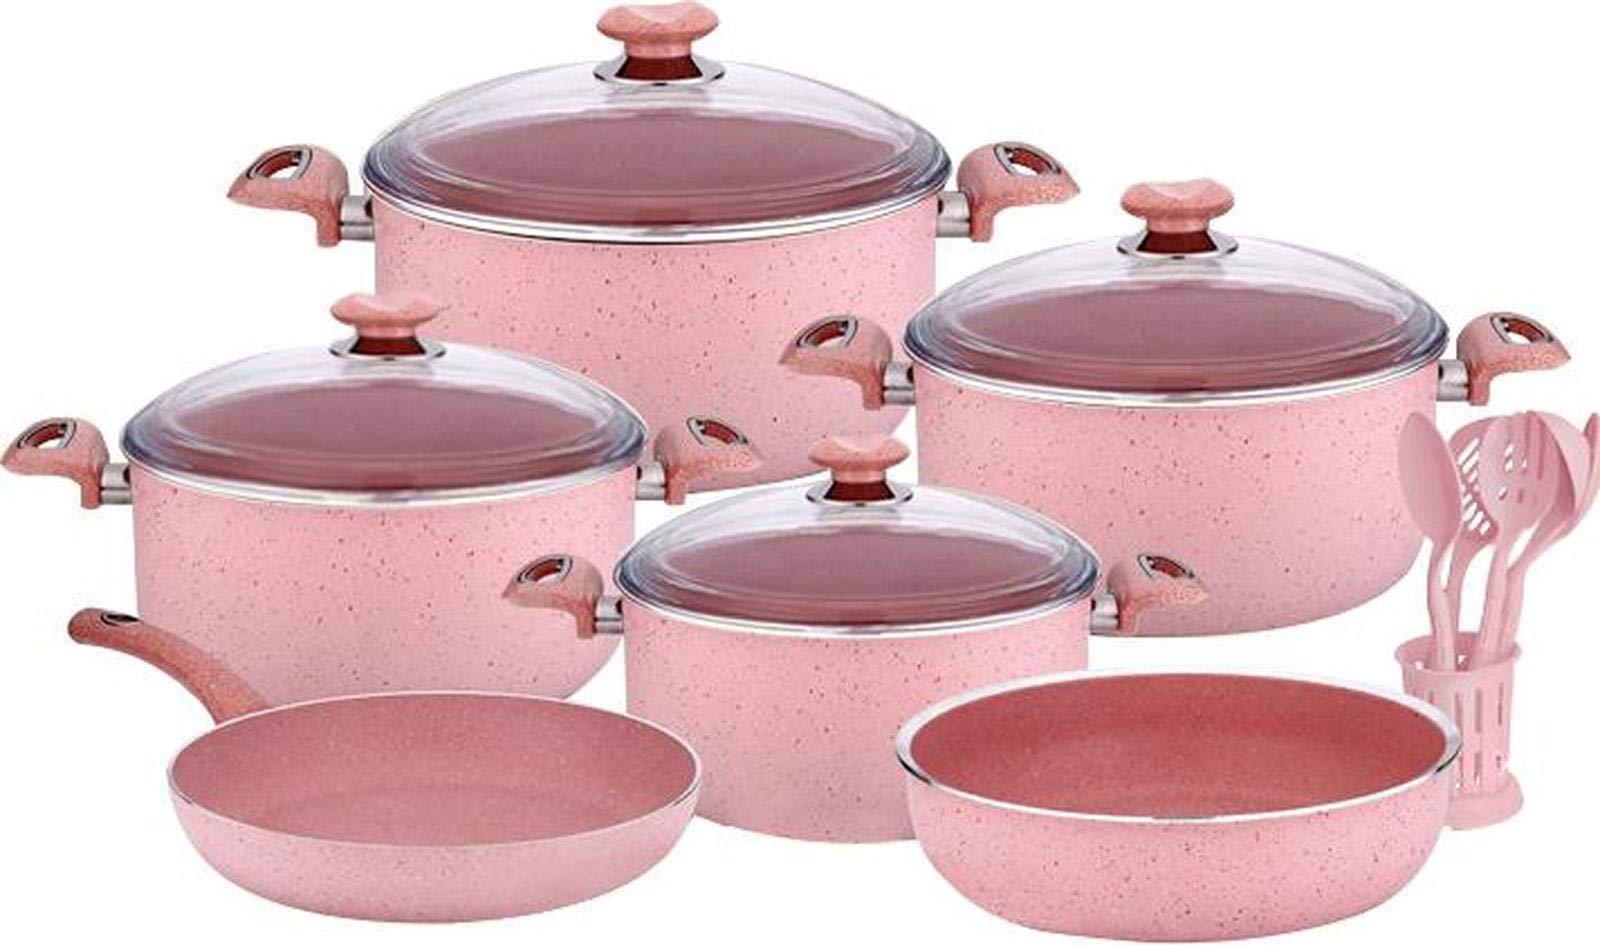 Pink Granite setts20cm x 10cmHand Split3 Pack Size Options available